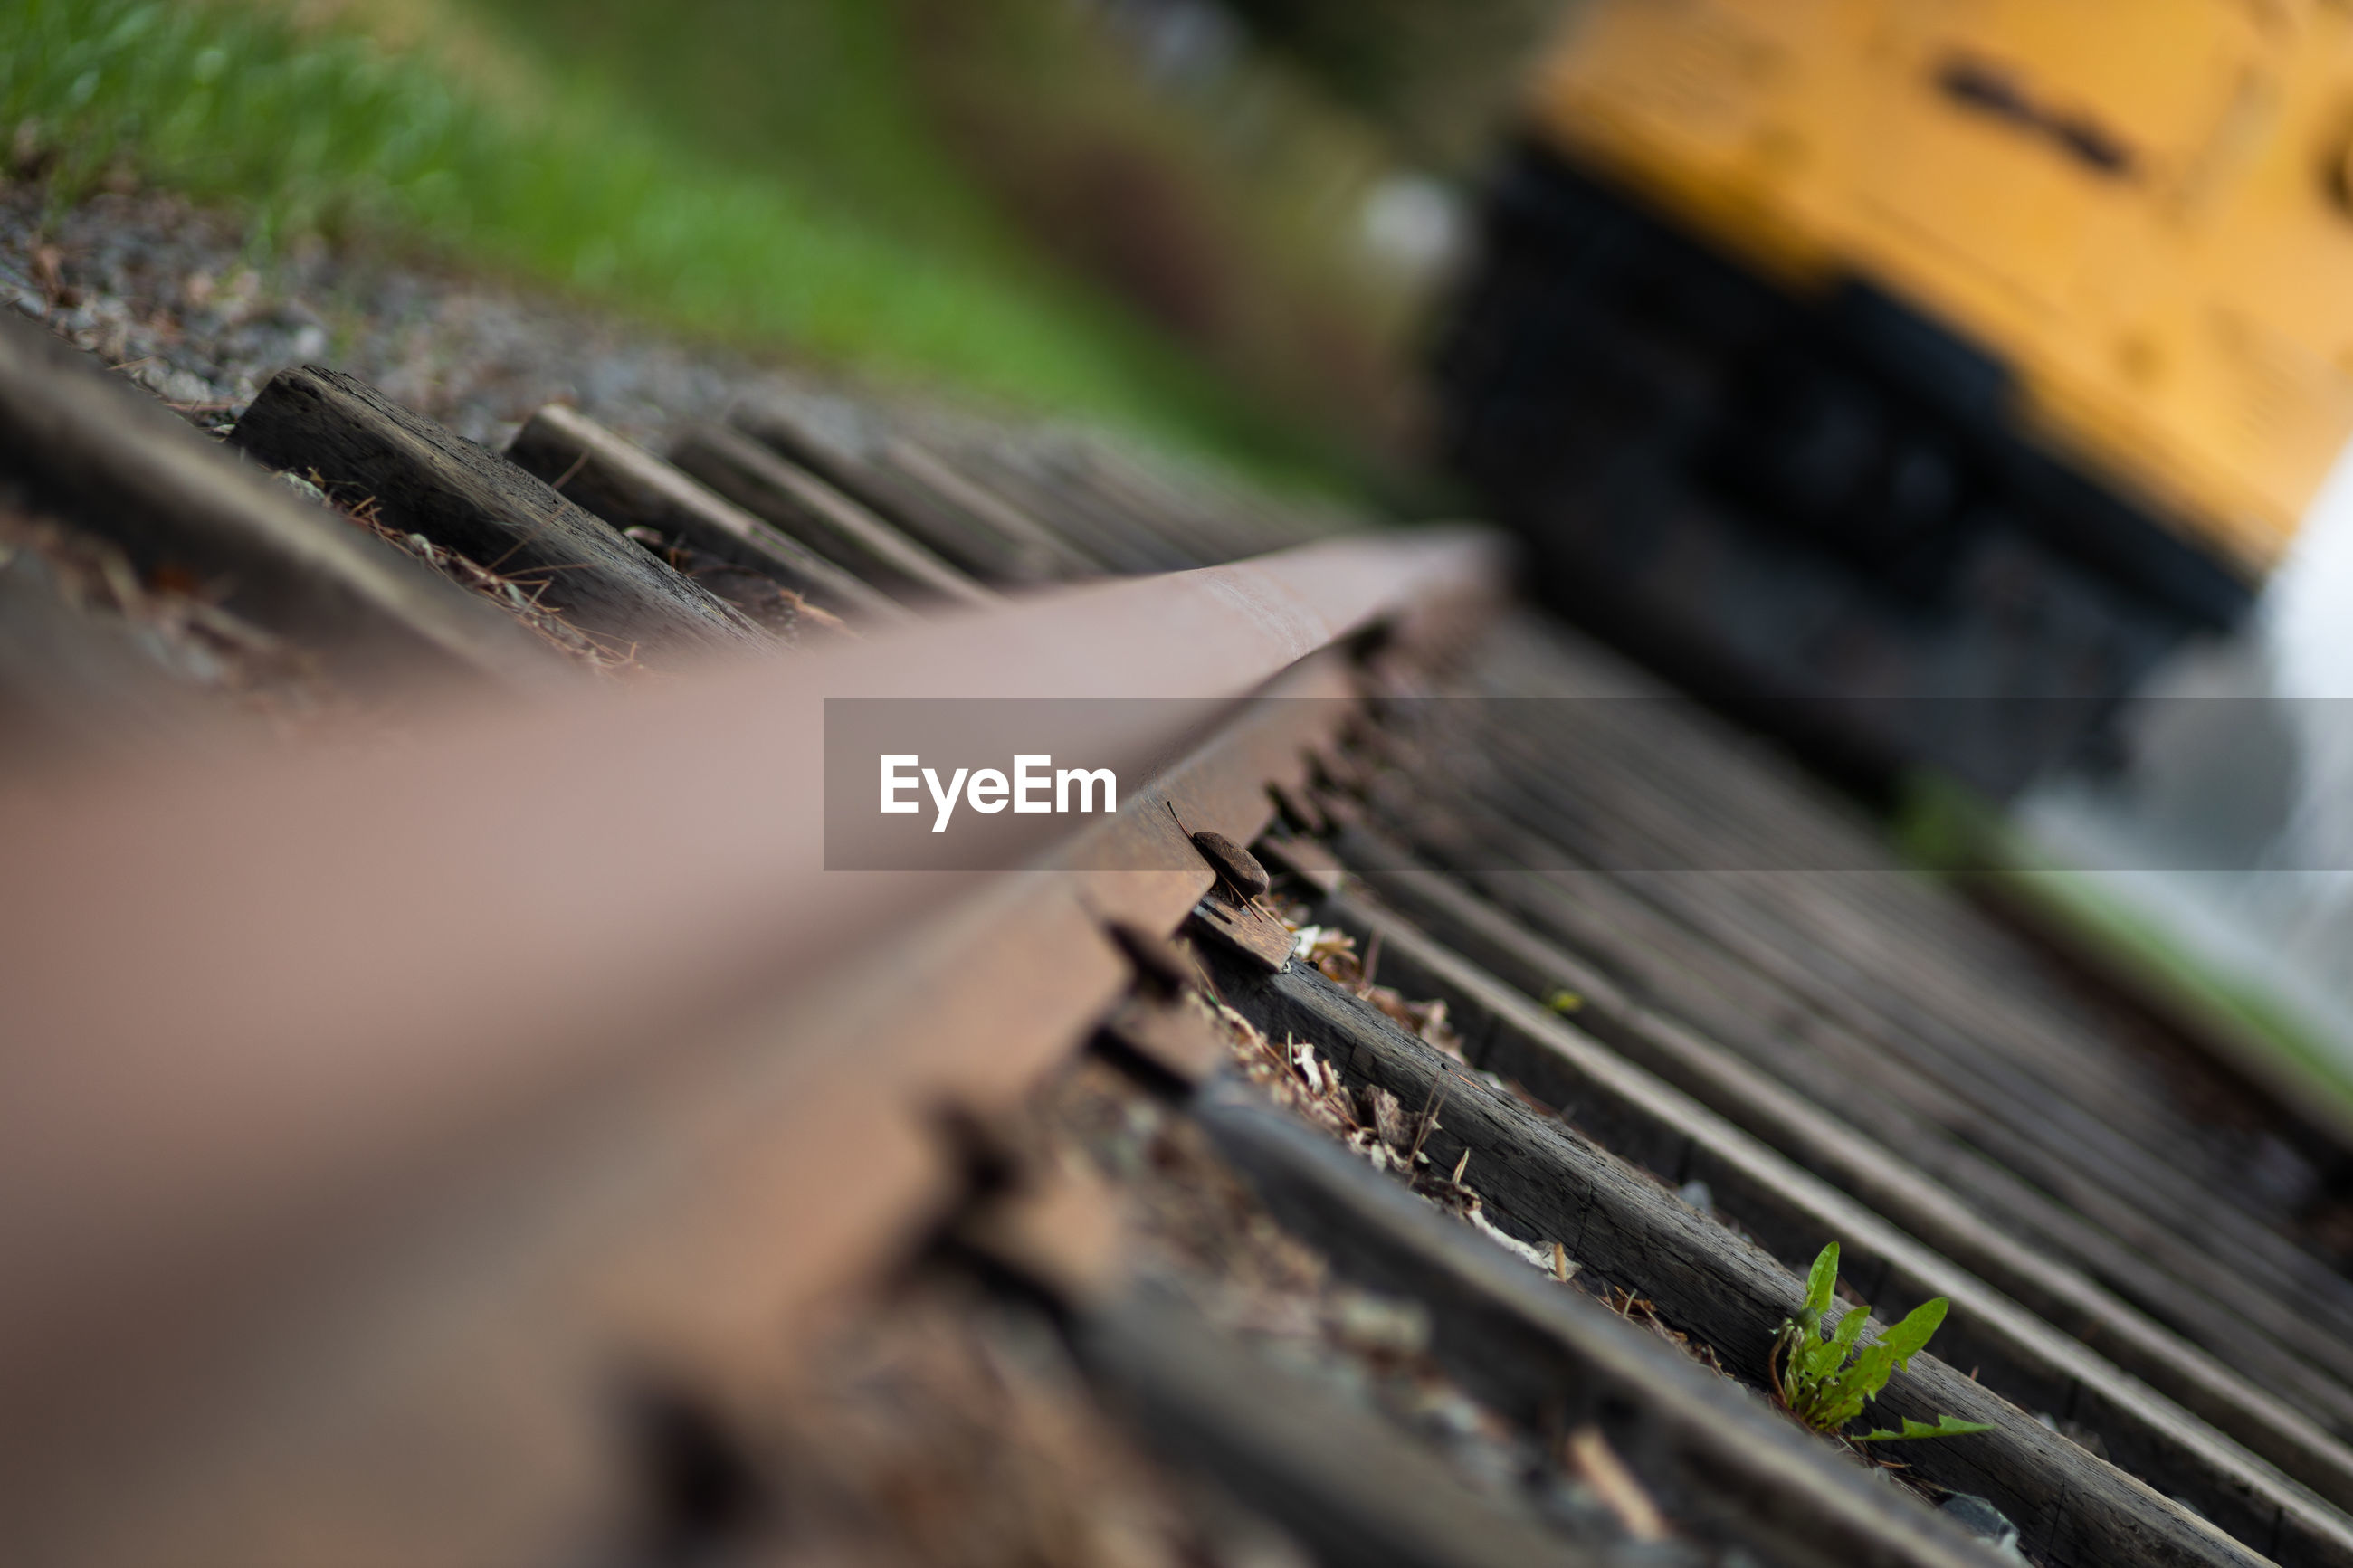 Angled train track